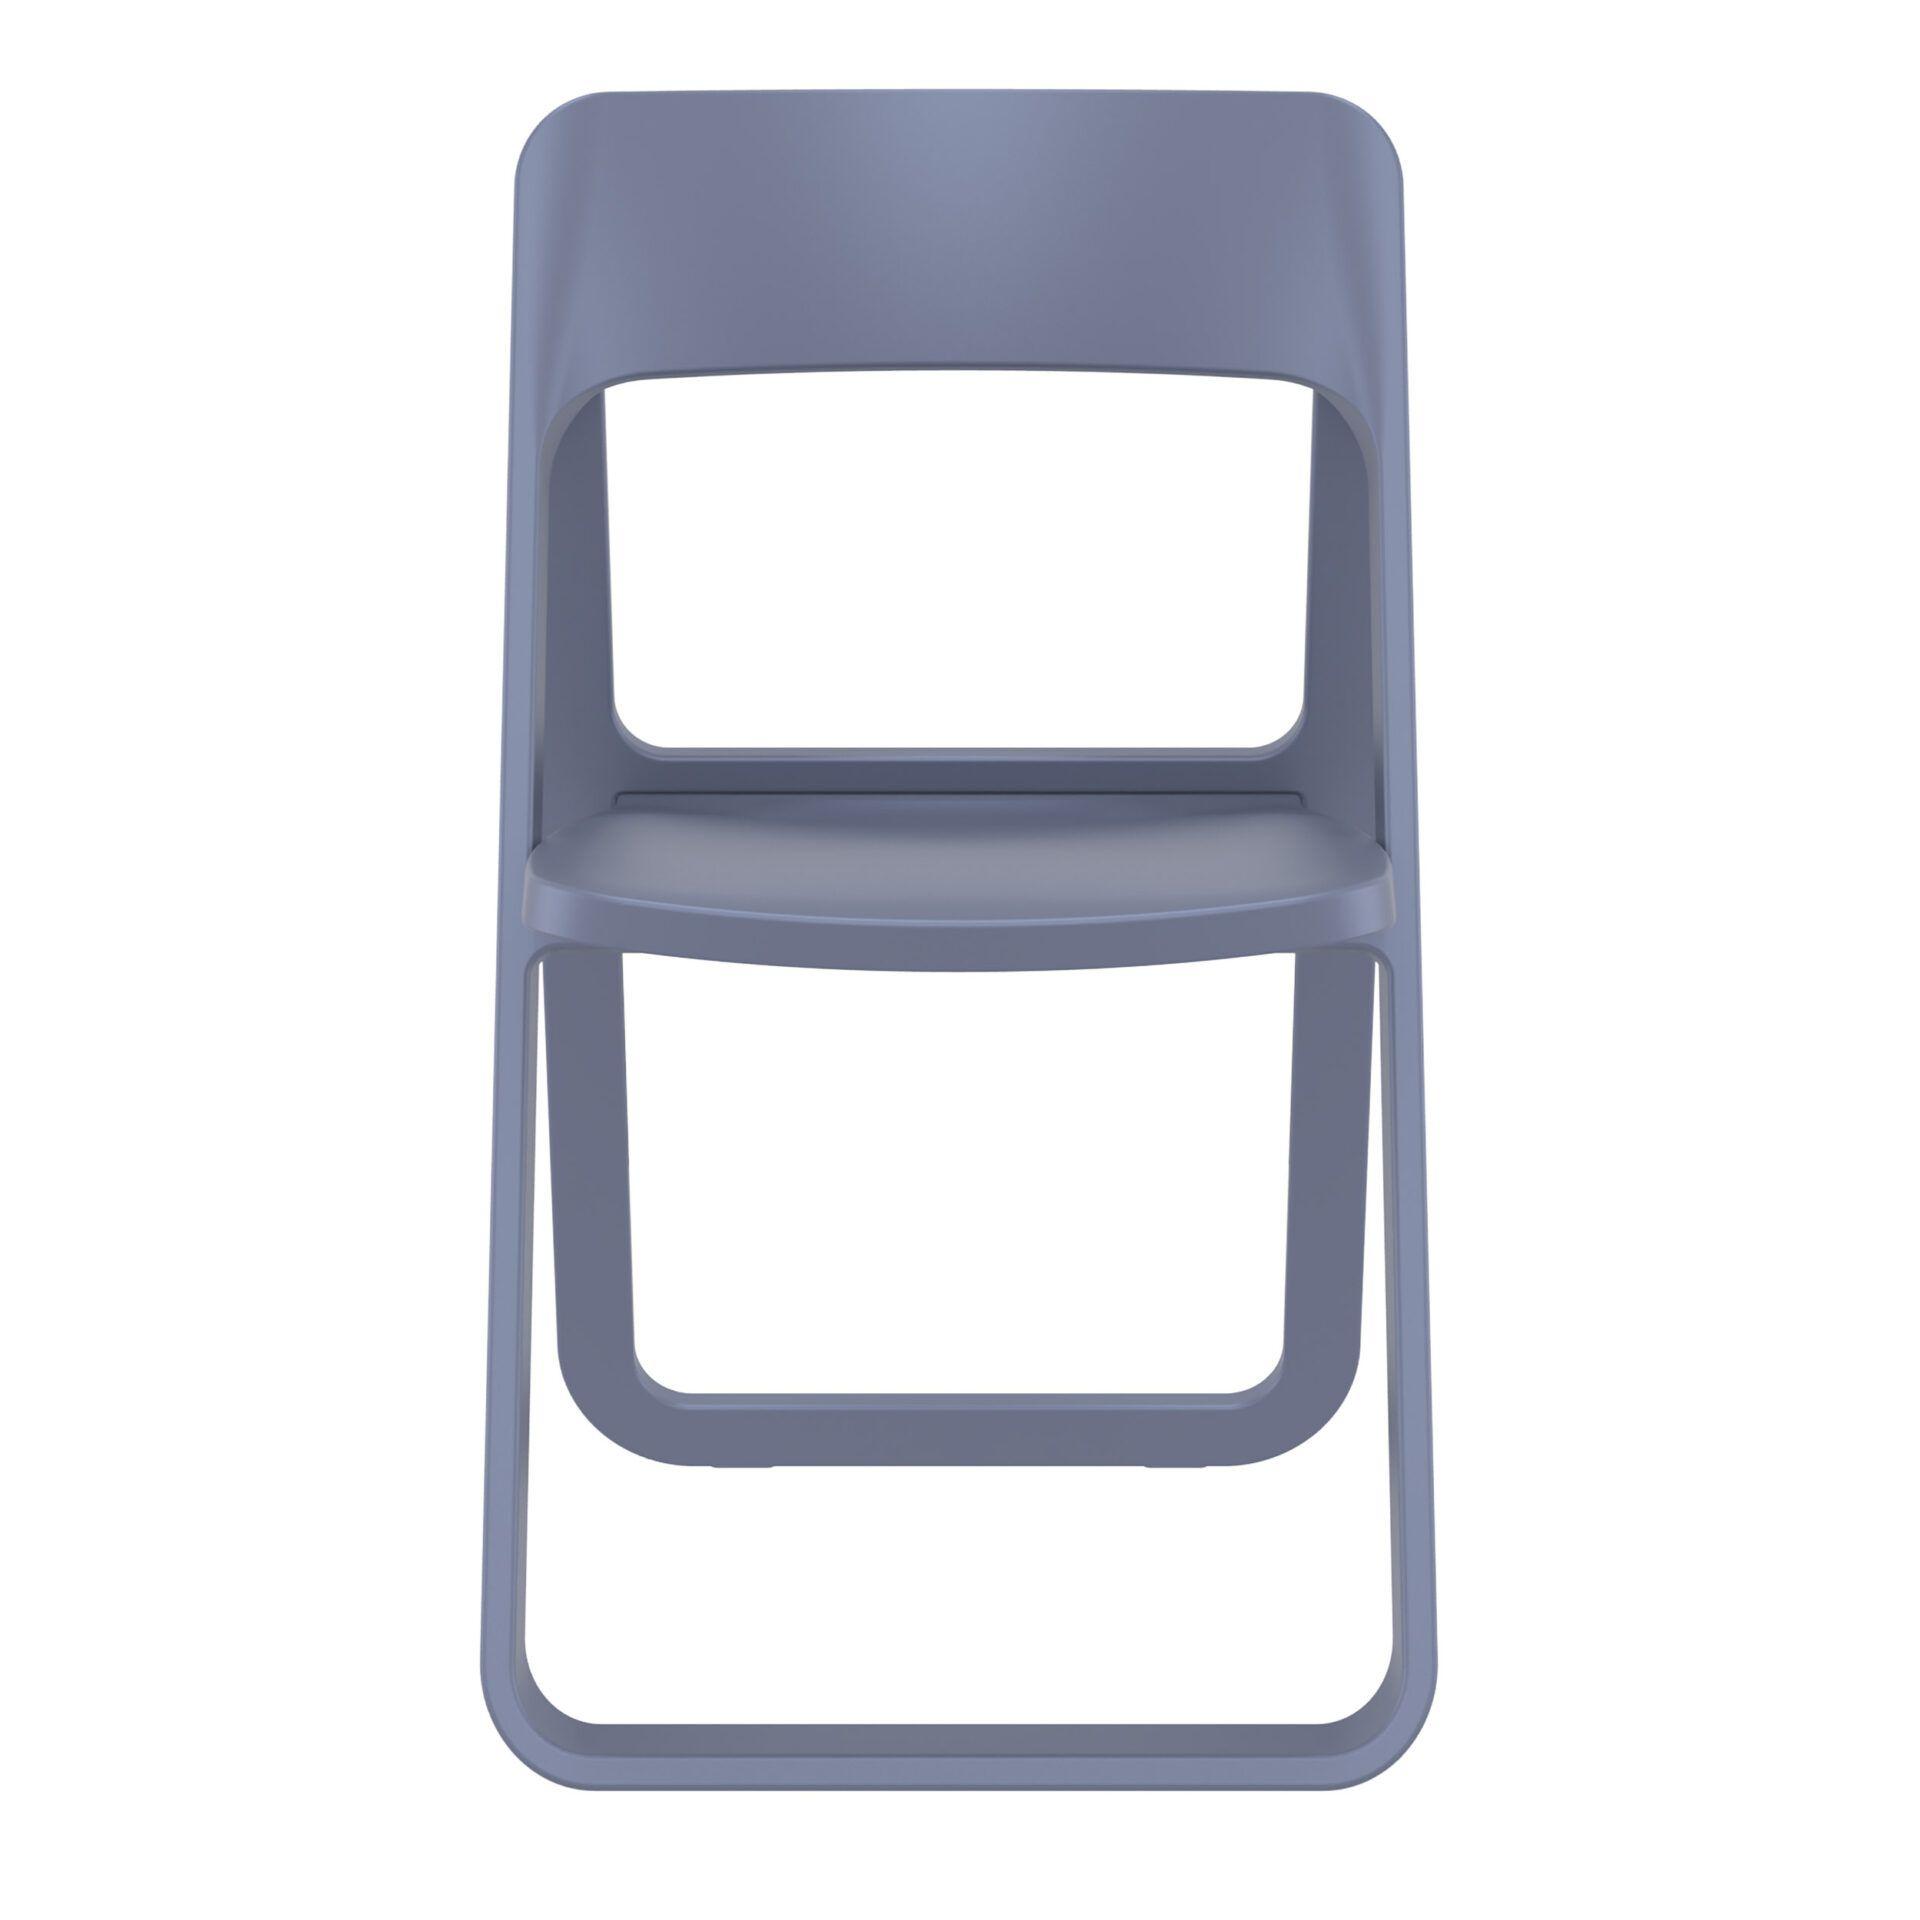 polypropylene dream folding chair darkgrey front